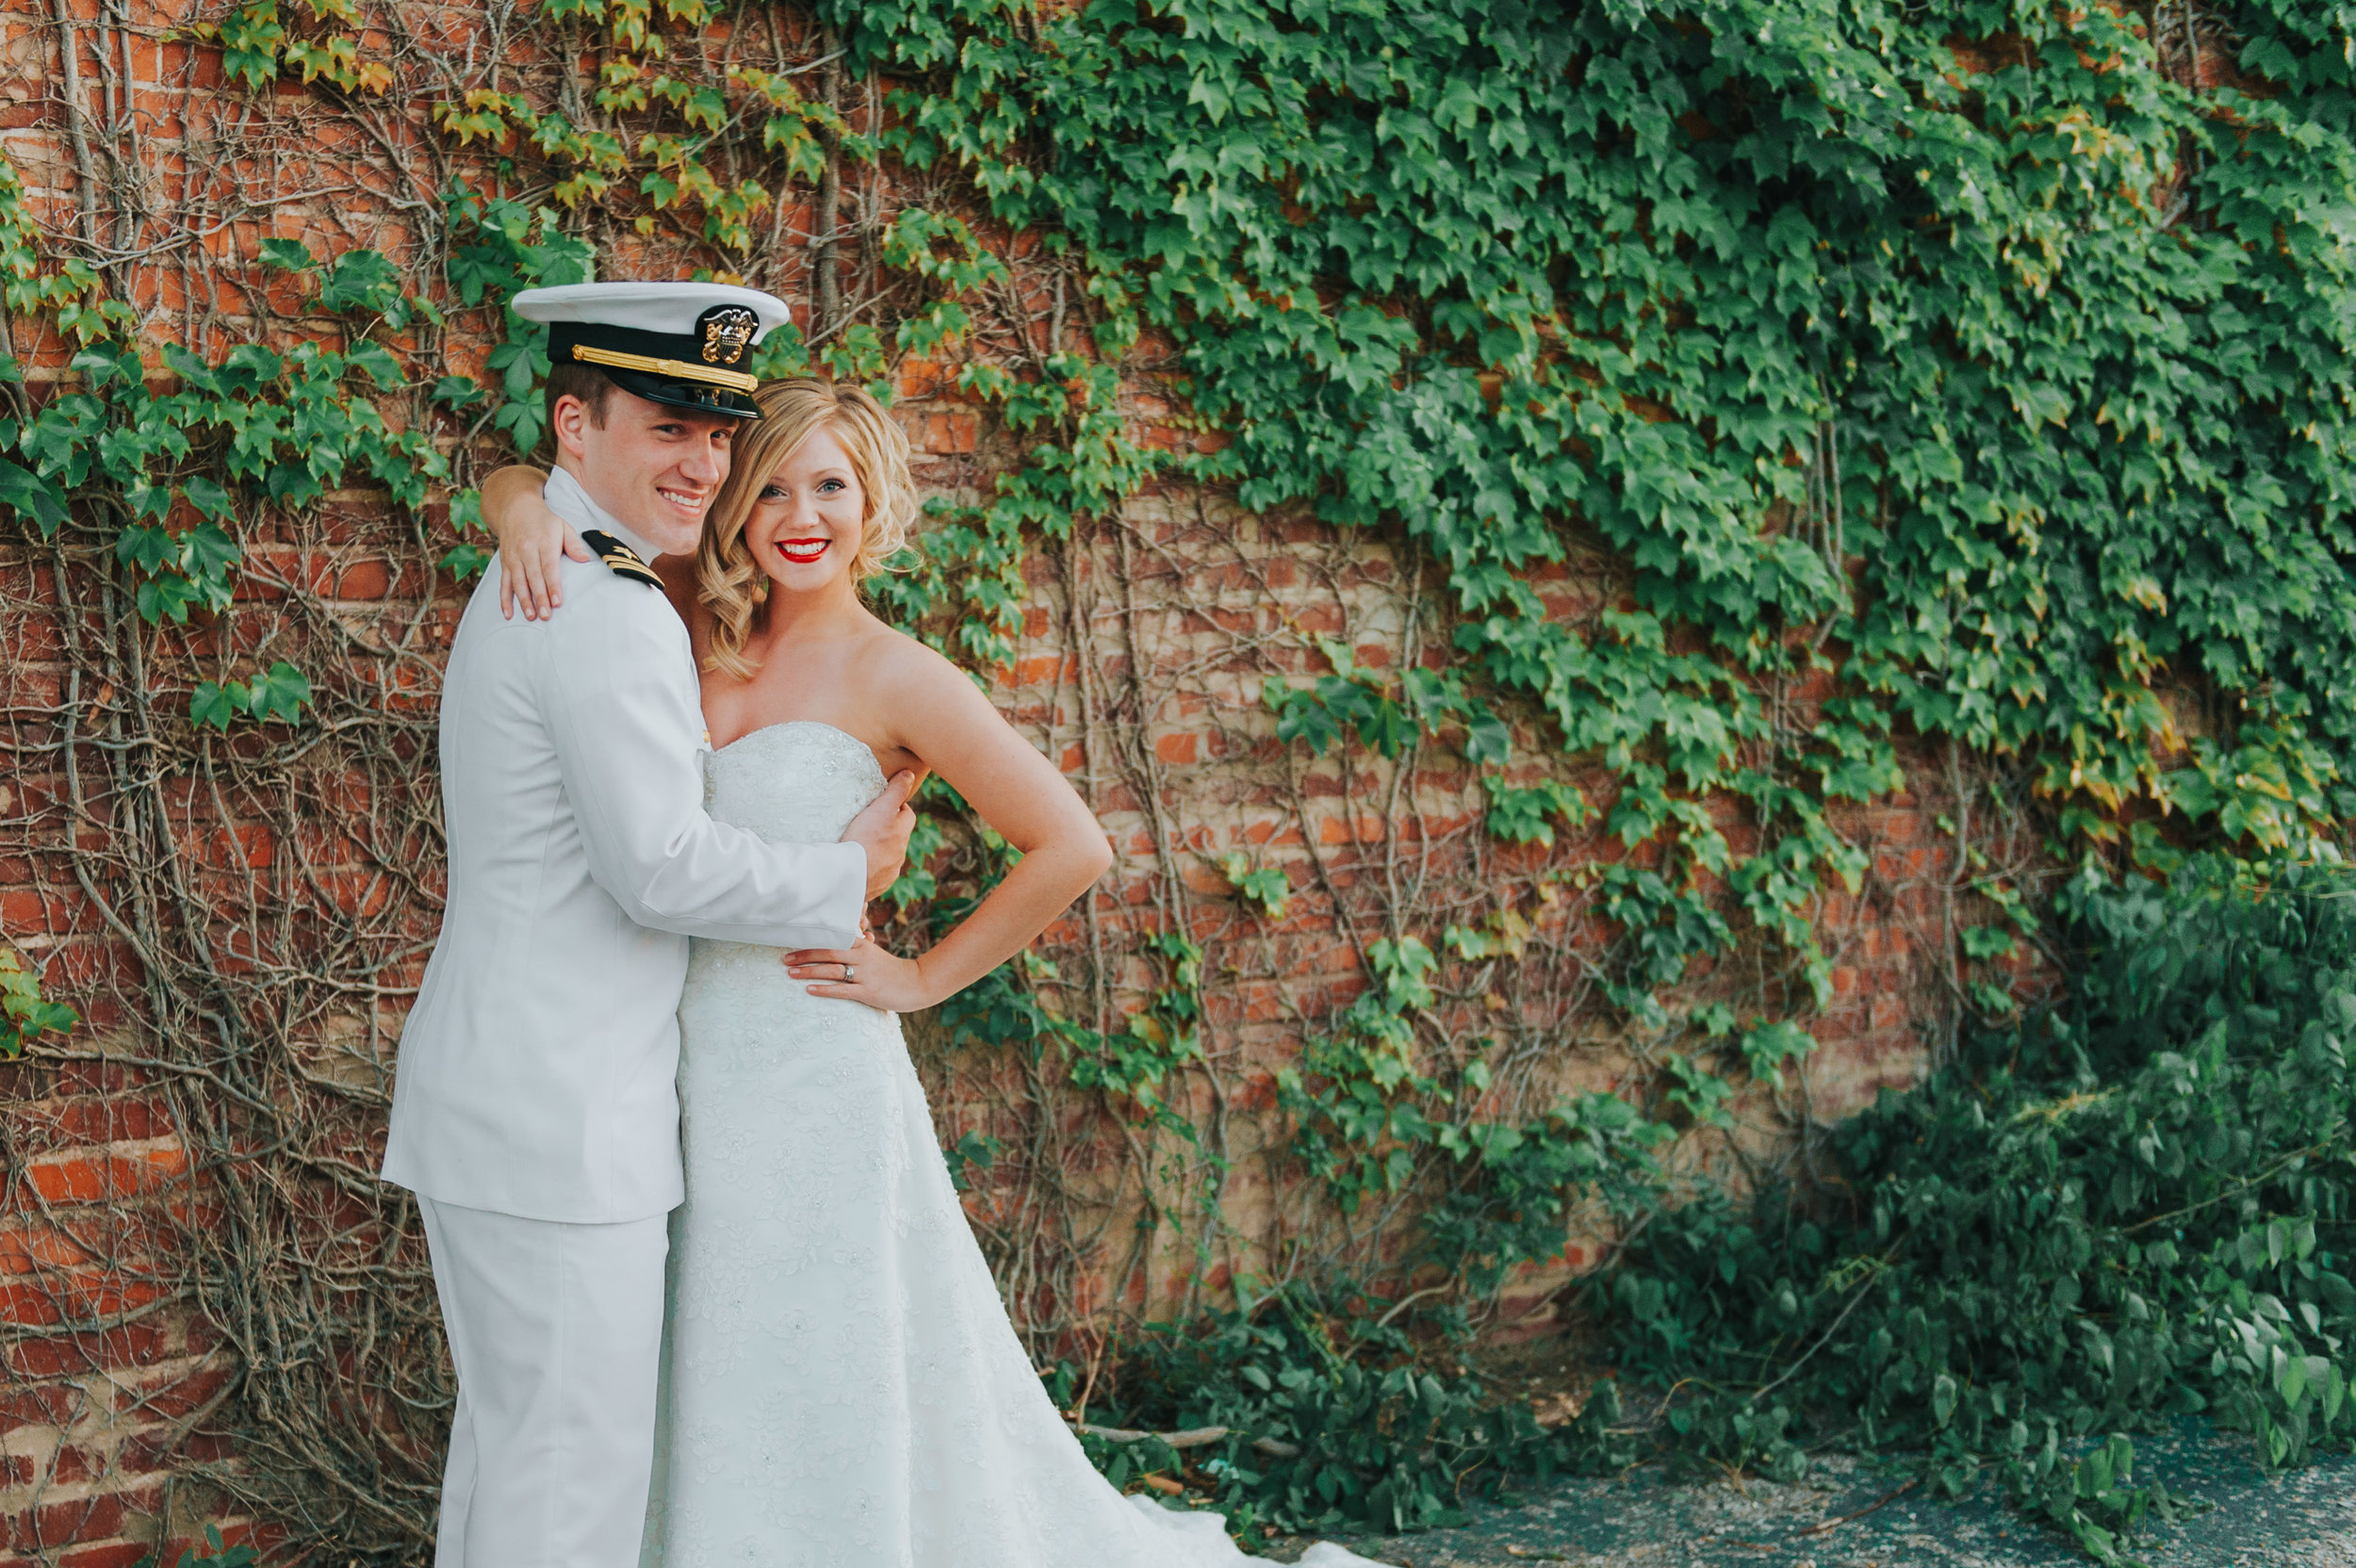 Whidbey-Island-Wedding-Photographer-J-Hodges (2 of 3).jpg